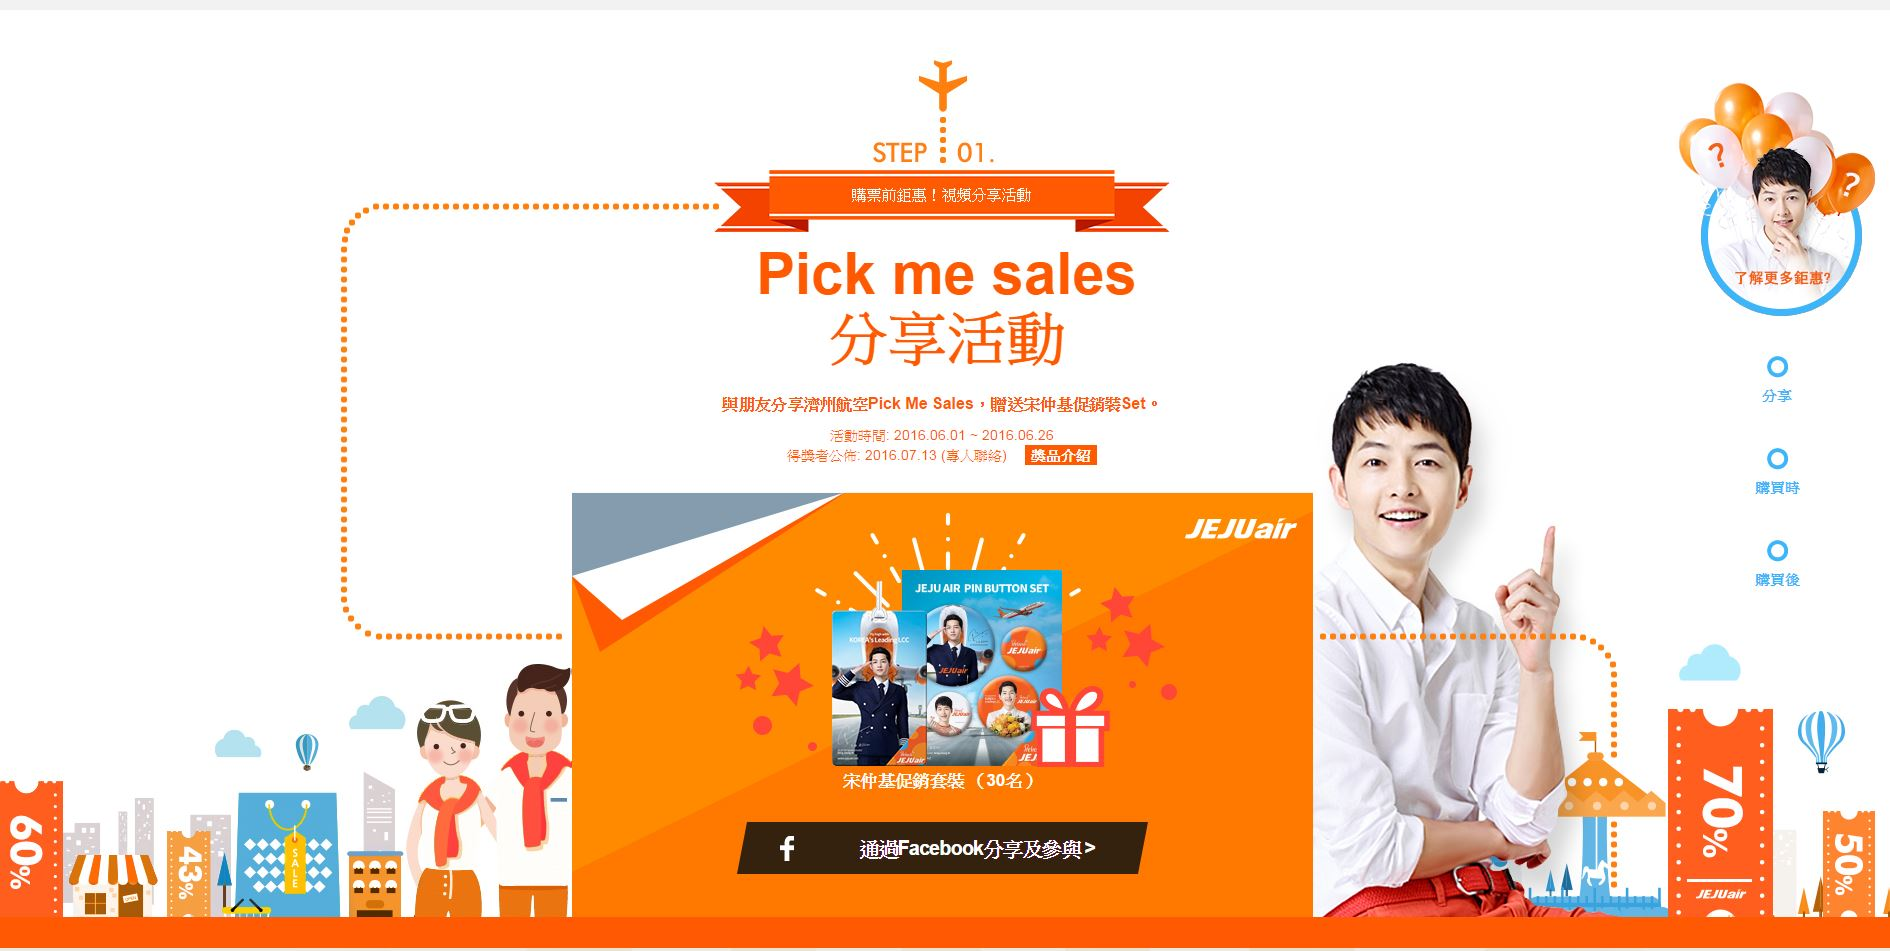 jeju-air-pick-me-up-sales-air-cheap-ticket-sale-summer-campaign-korea-travel (2)